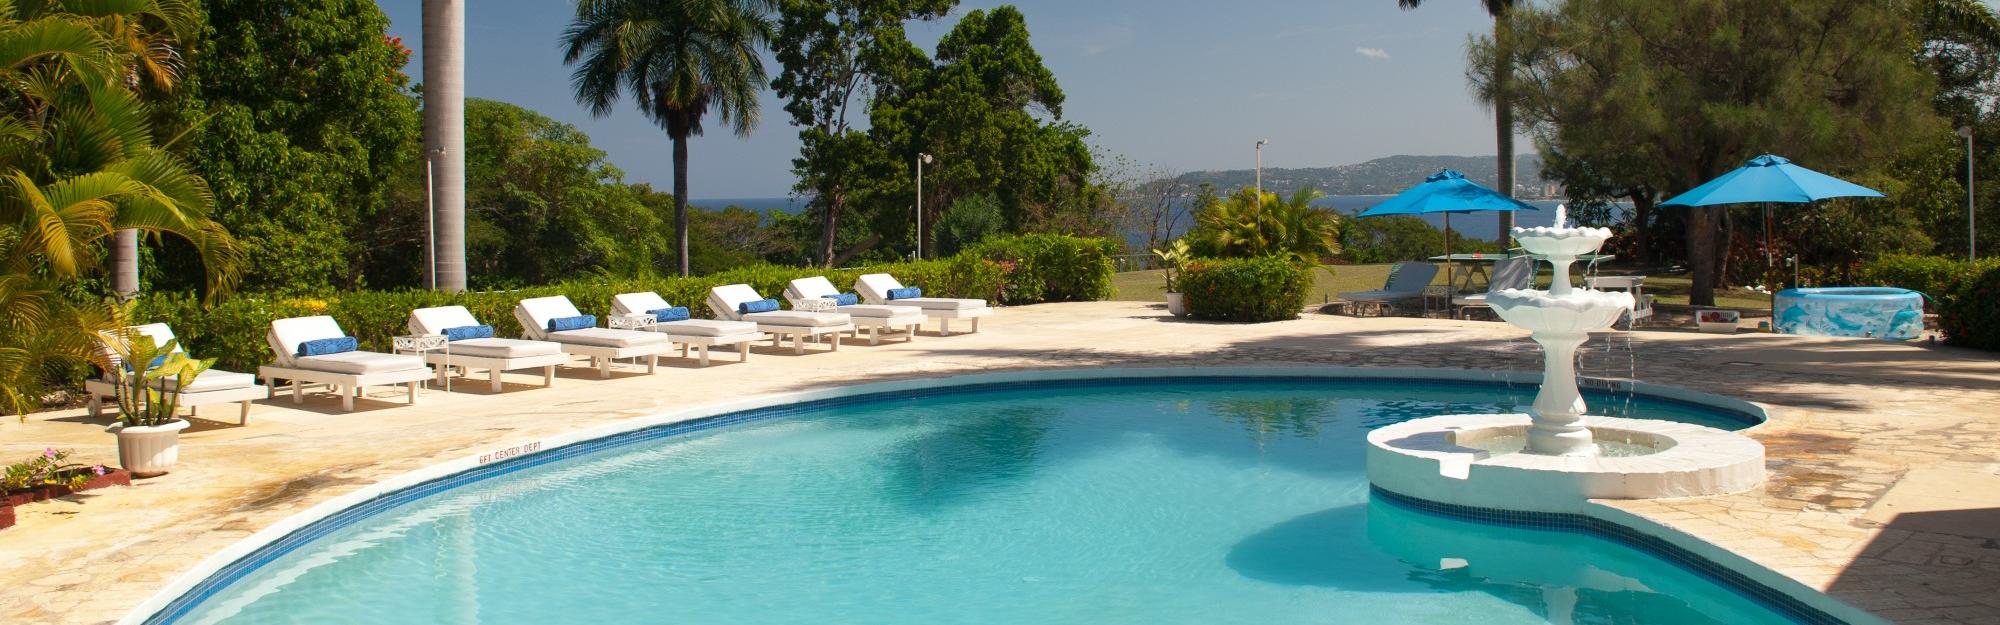 Summertime Jamaica Villa By Linda Smith